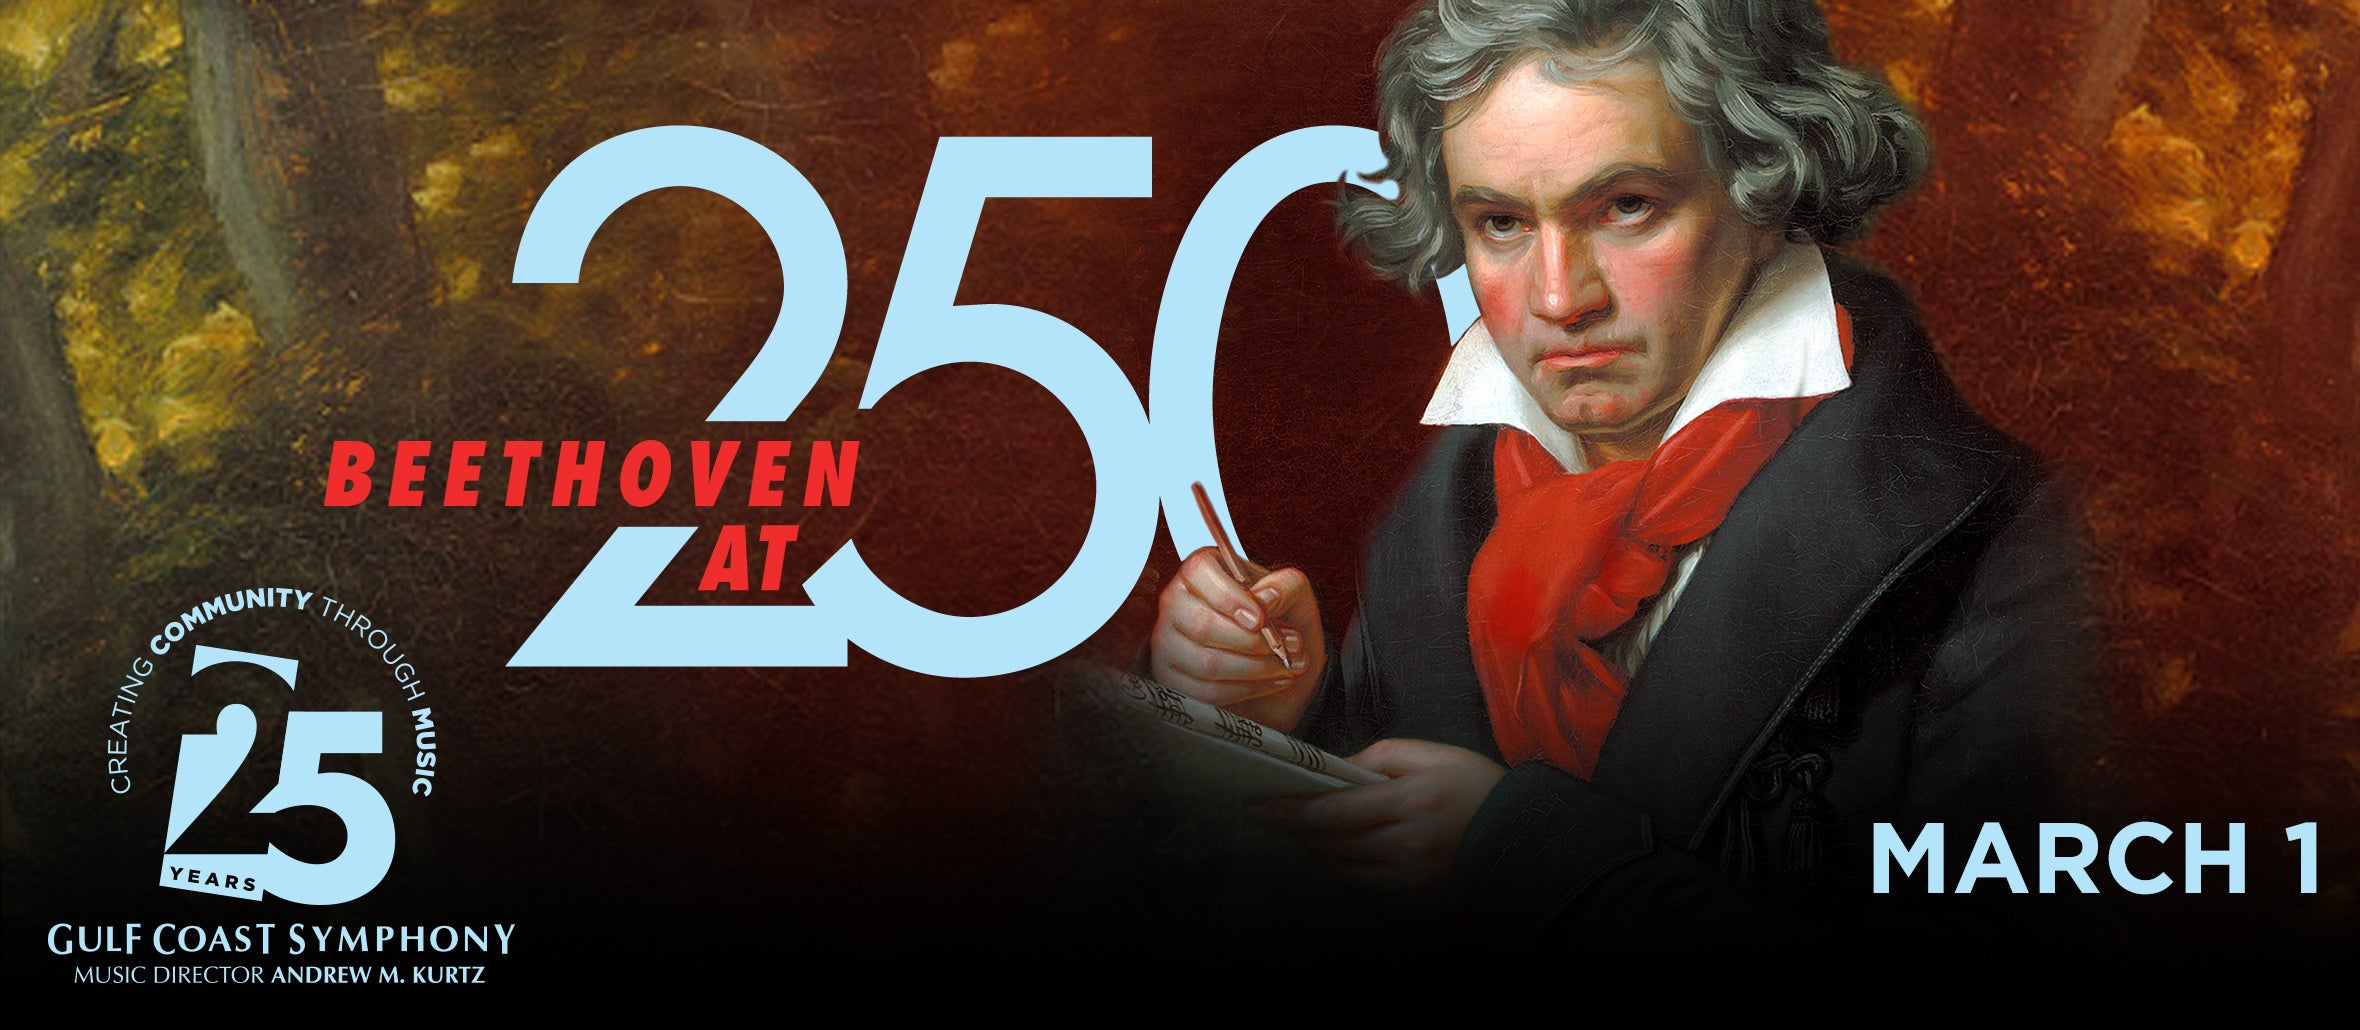 Gulf Coast Symphony: Beethoven At 250